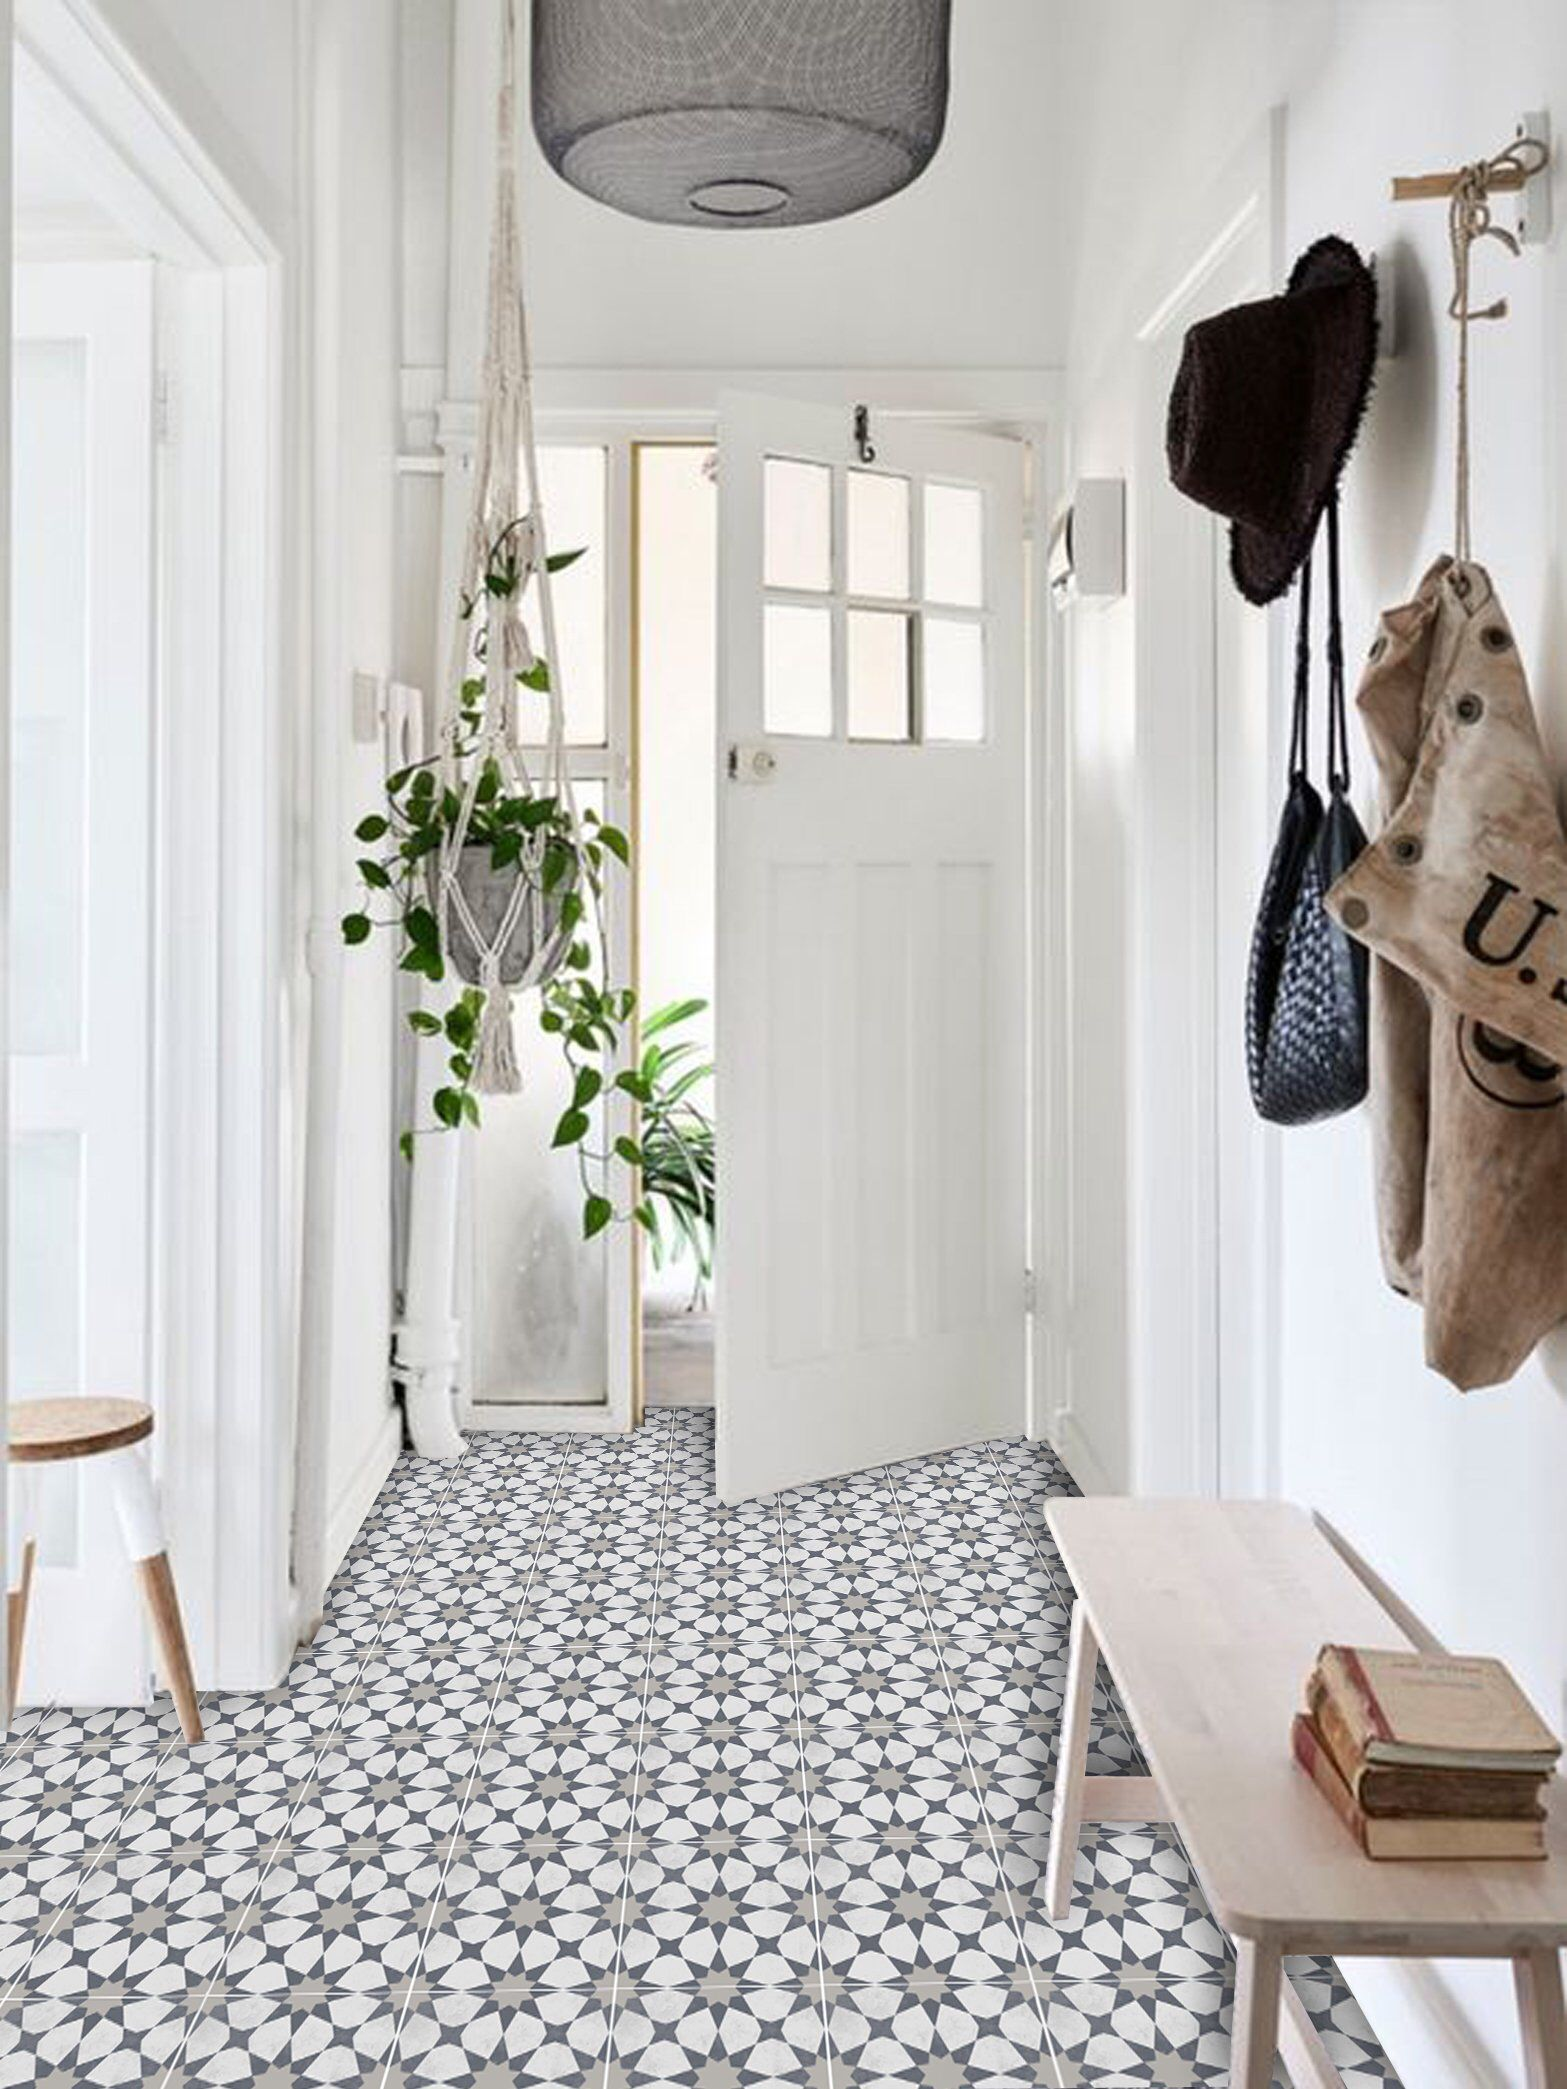 Hallway furniture b&m  Agadir Vinyl Tile Sticker Pack in Grey  Tile Decals  Floor